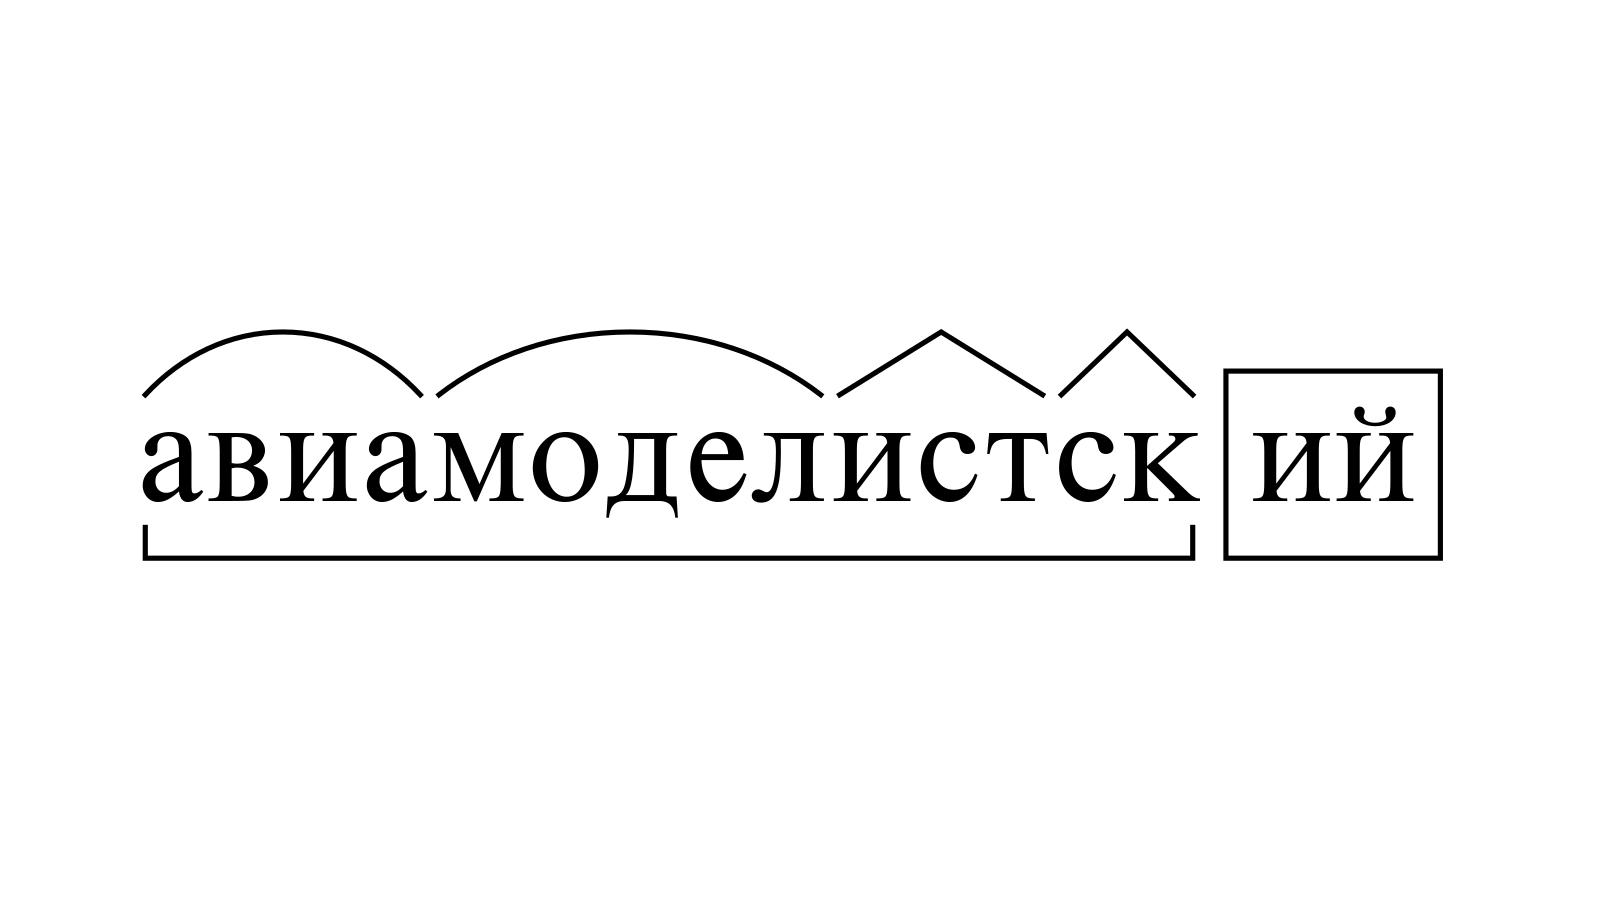 Разбор слова «авиамоделистский» по составу